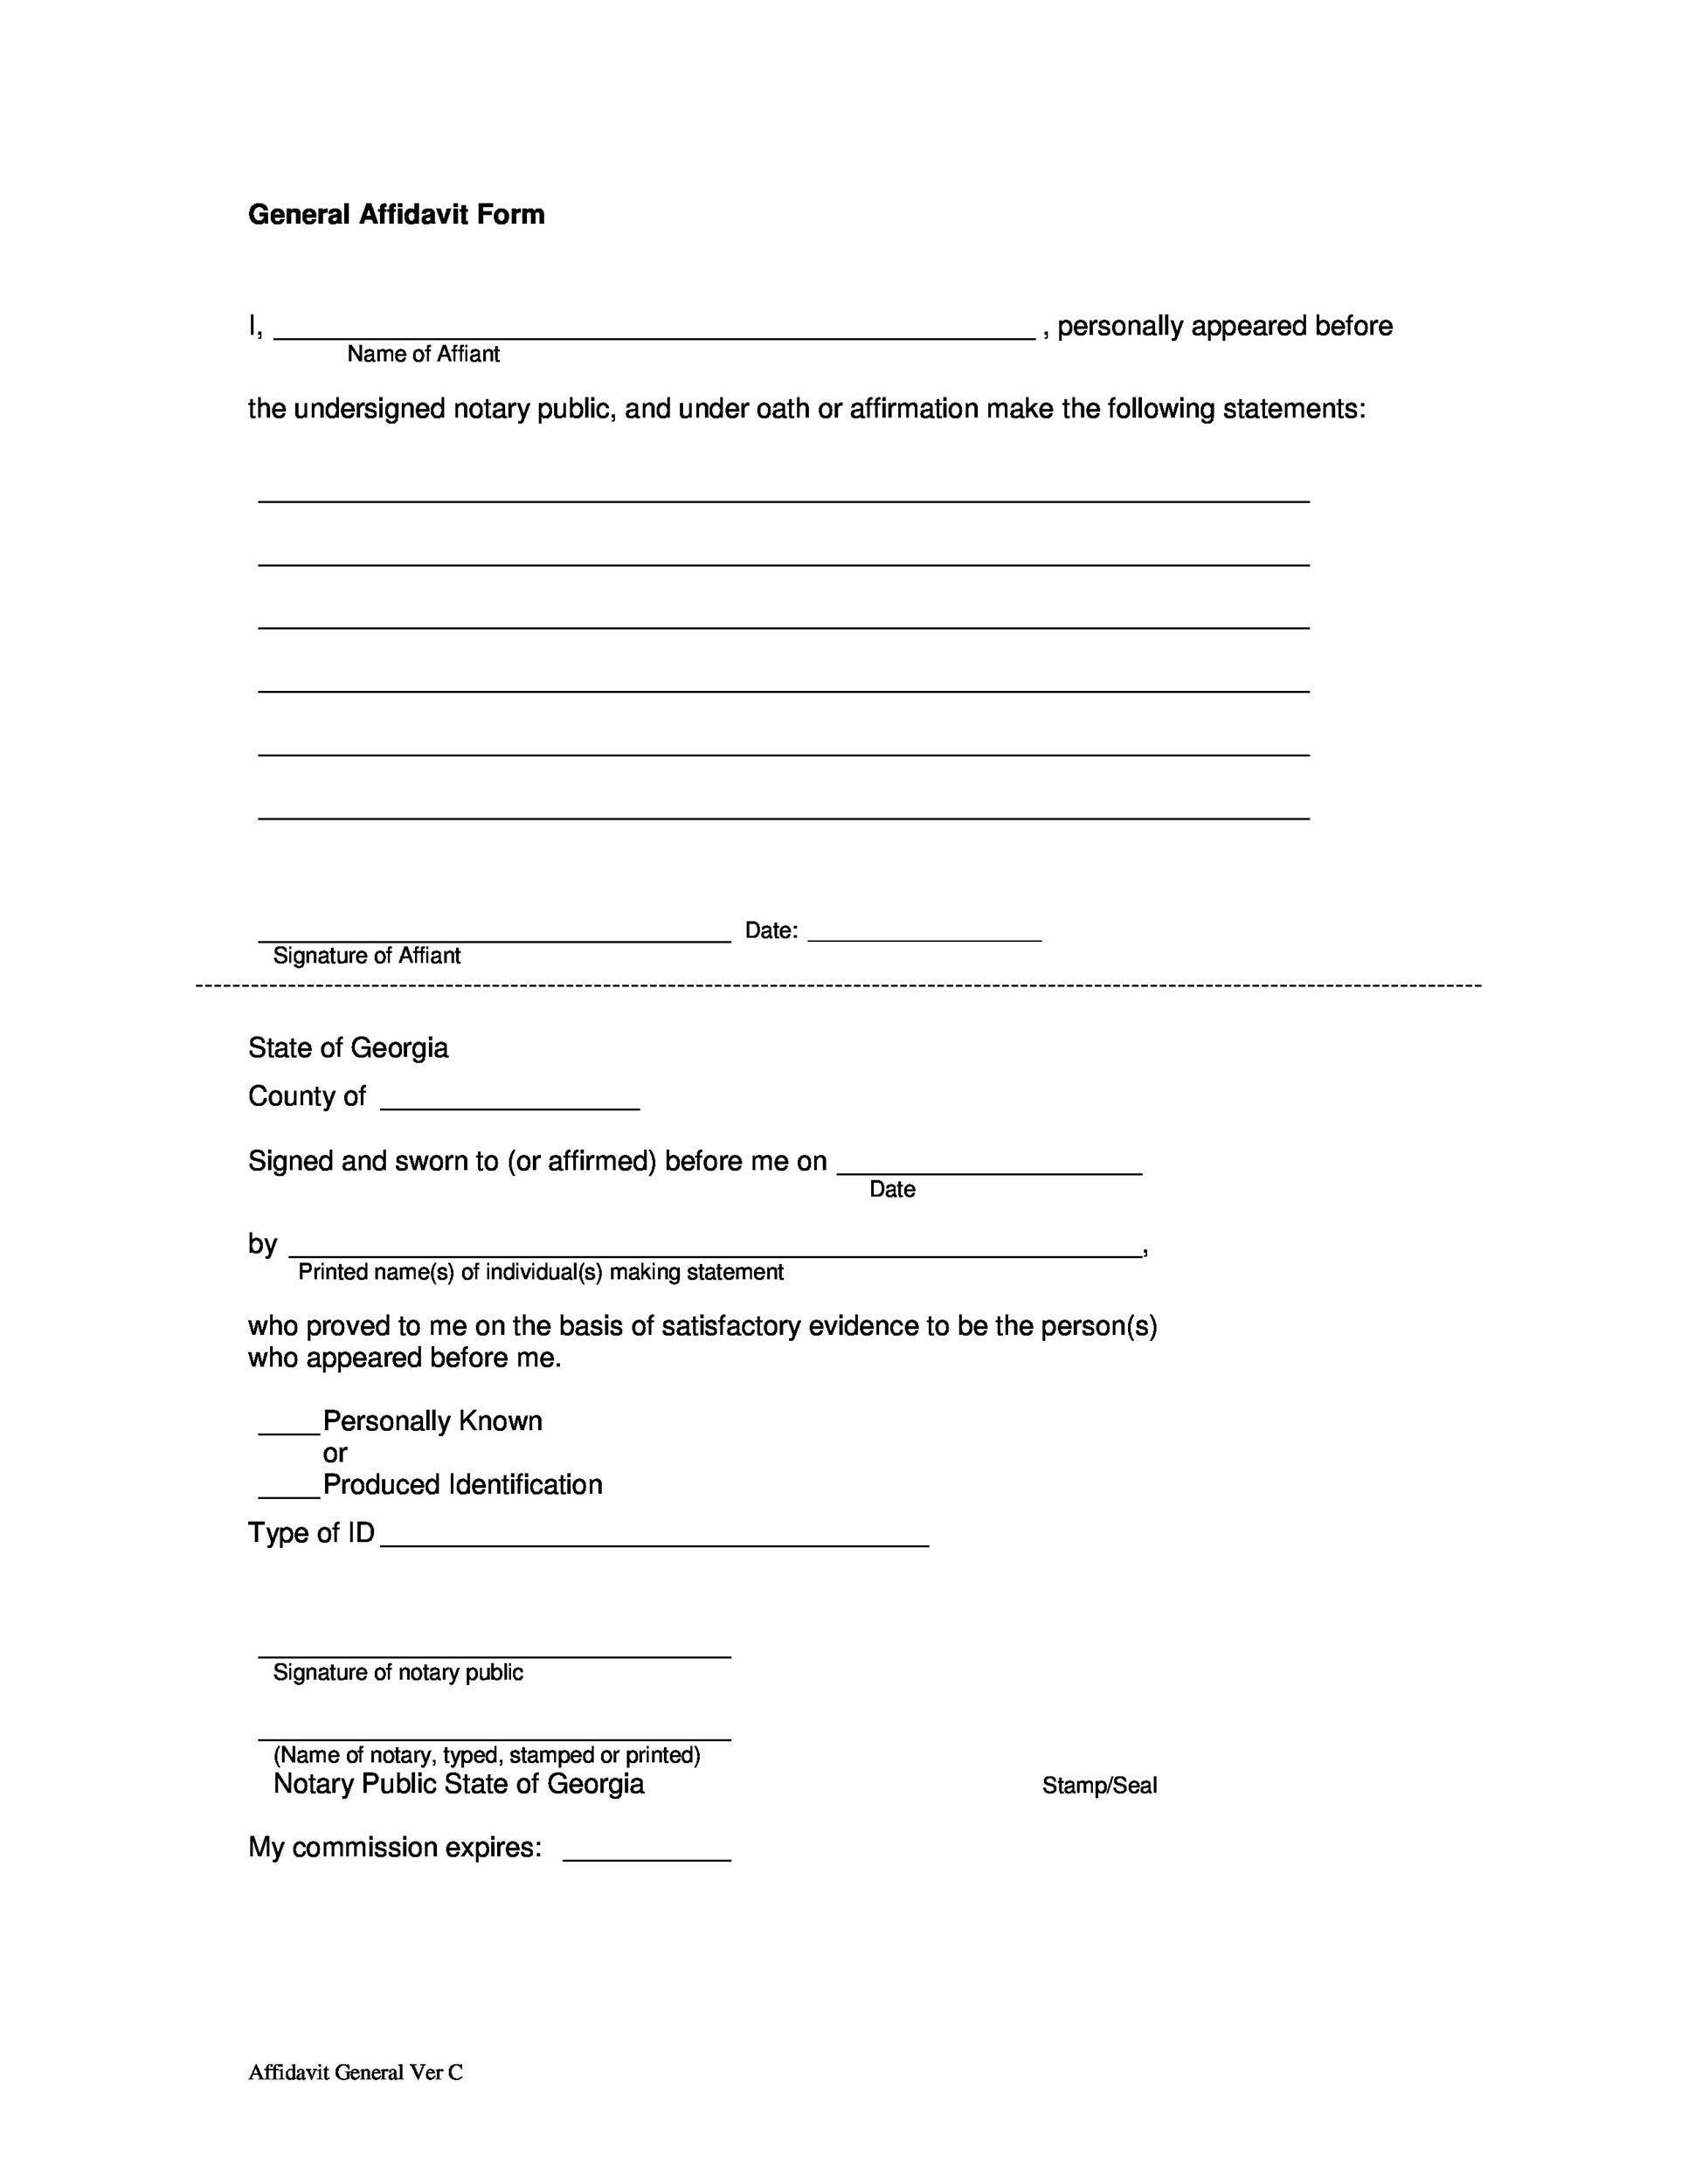 Free affidavit form 12